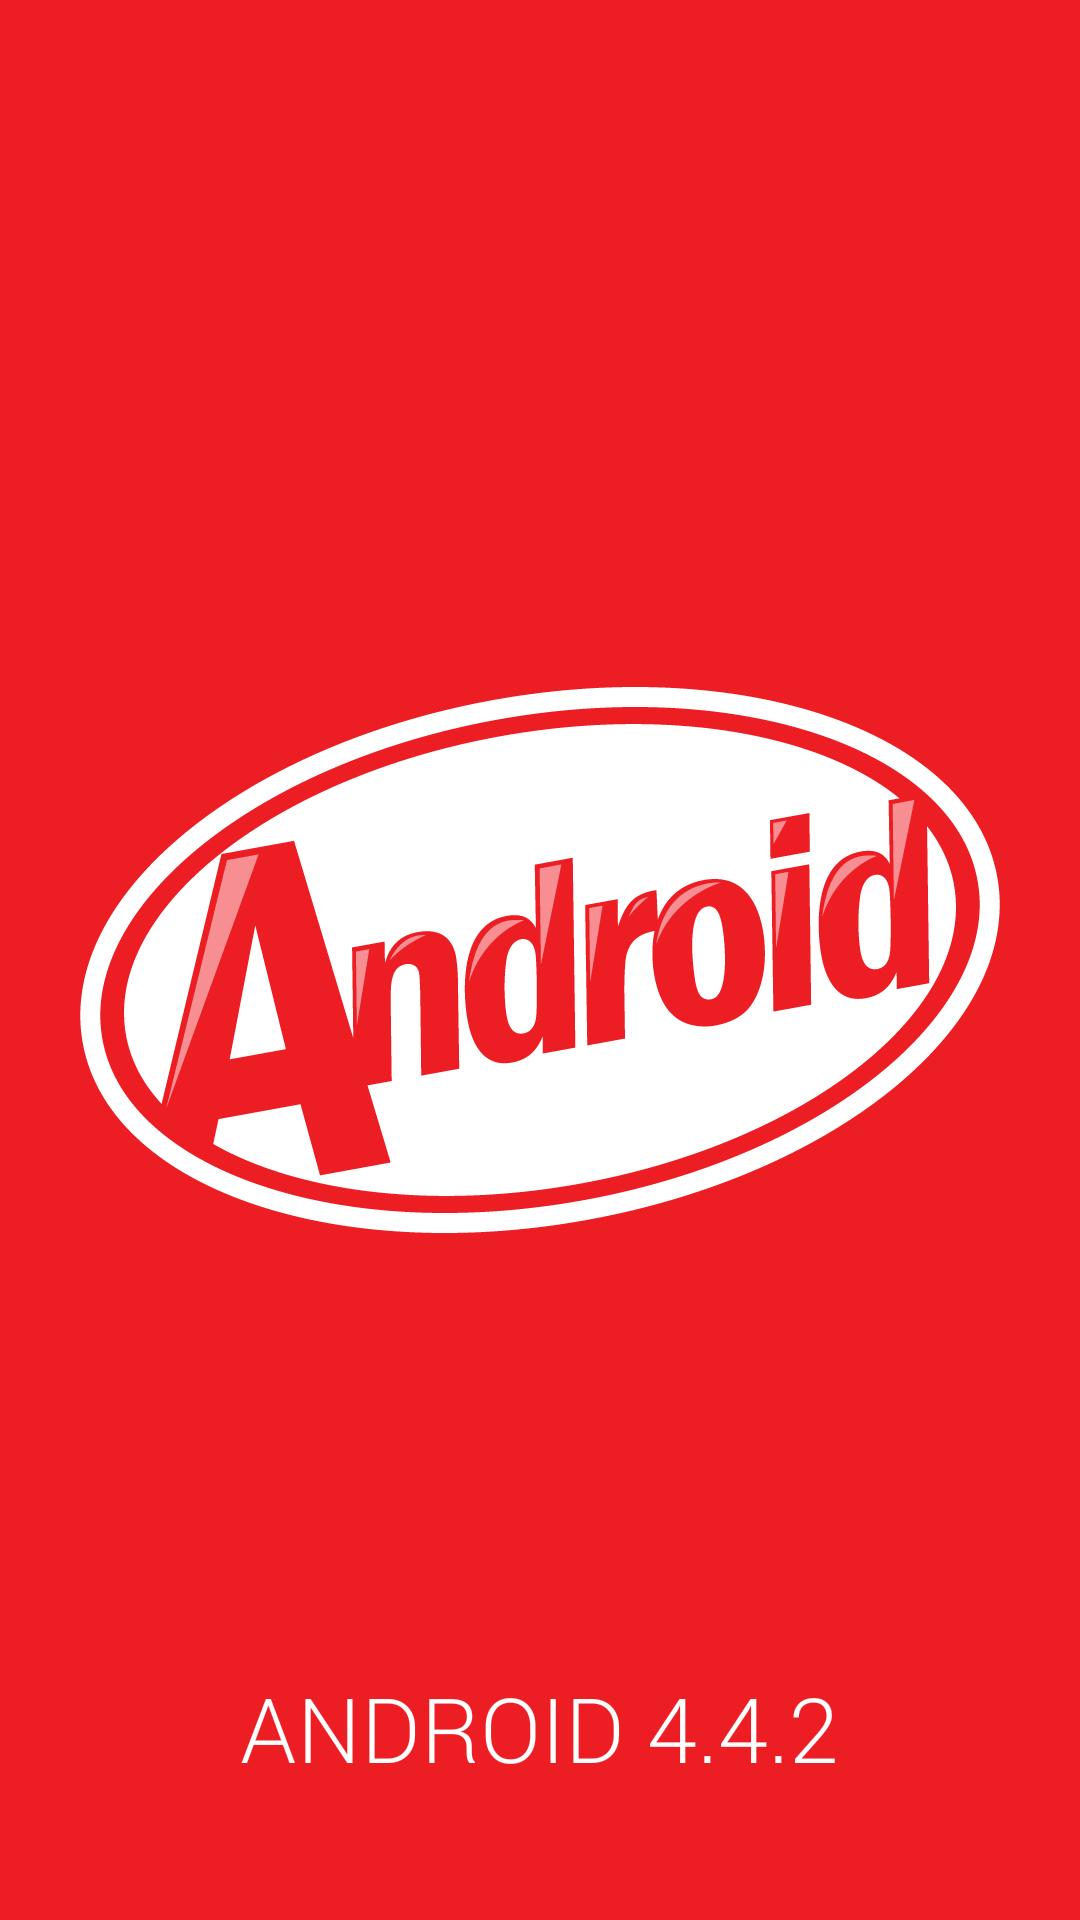 [ROM 4.4.2][SM-N9005] Rom Stock Samsung Android KitKat 4.4.2 [XXUENA6] [12.01.2014] Screenshot_2014-01-12-19-57-28